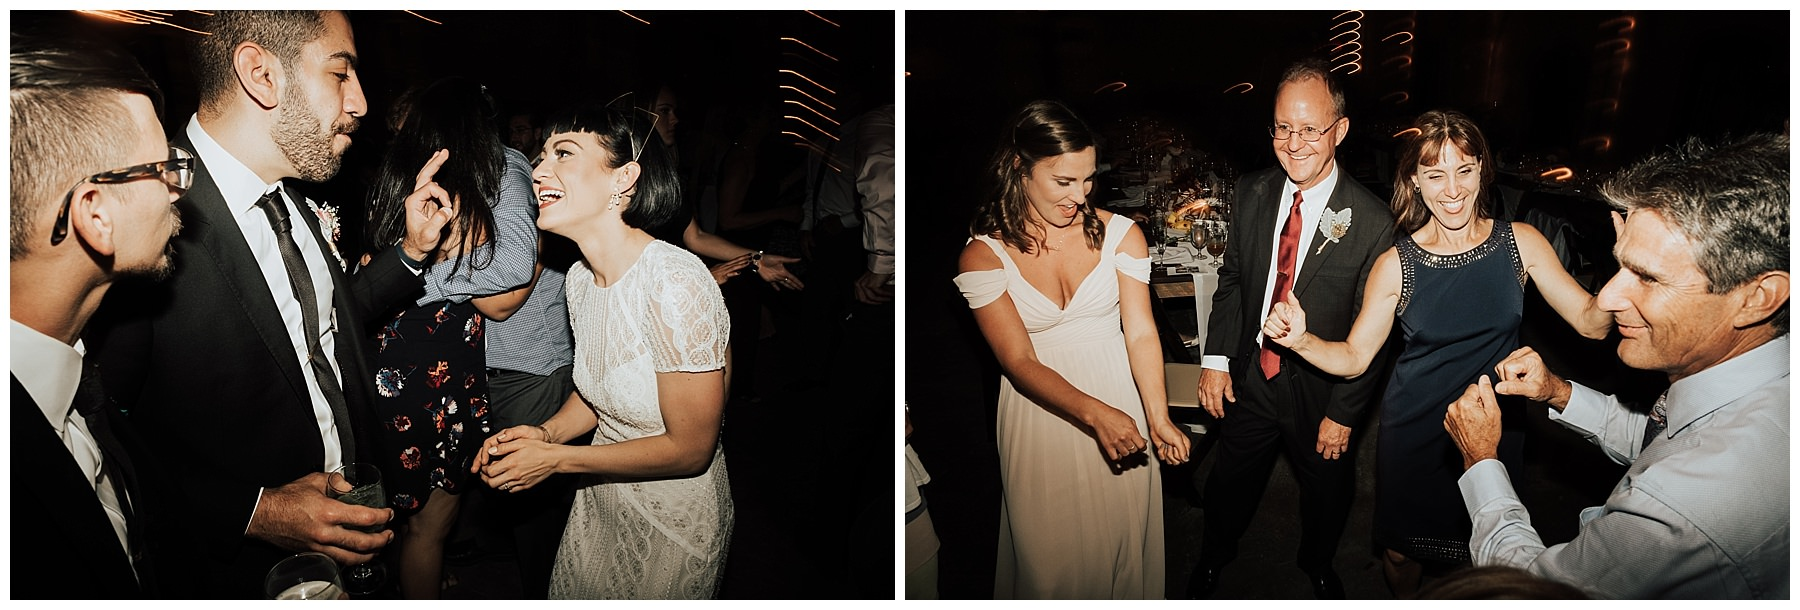 Jon and Jen New York Wedding-246.jpg